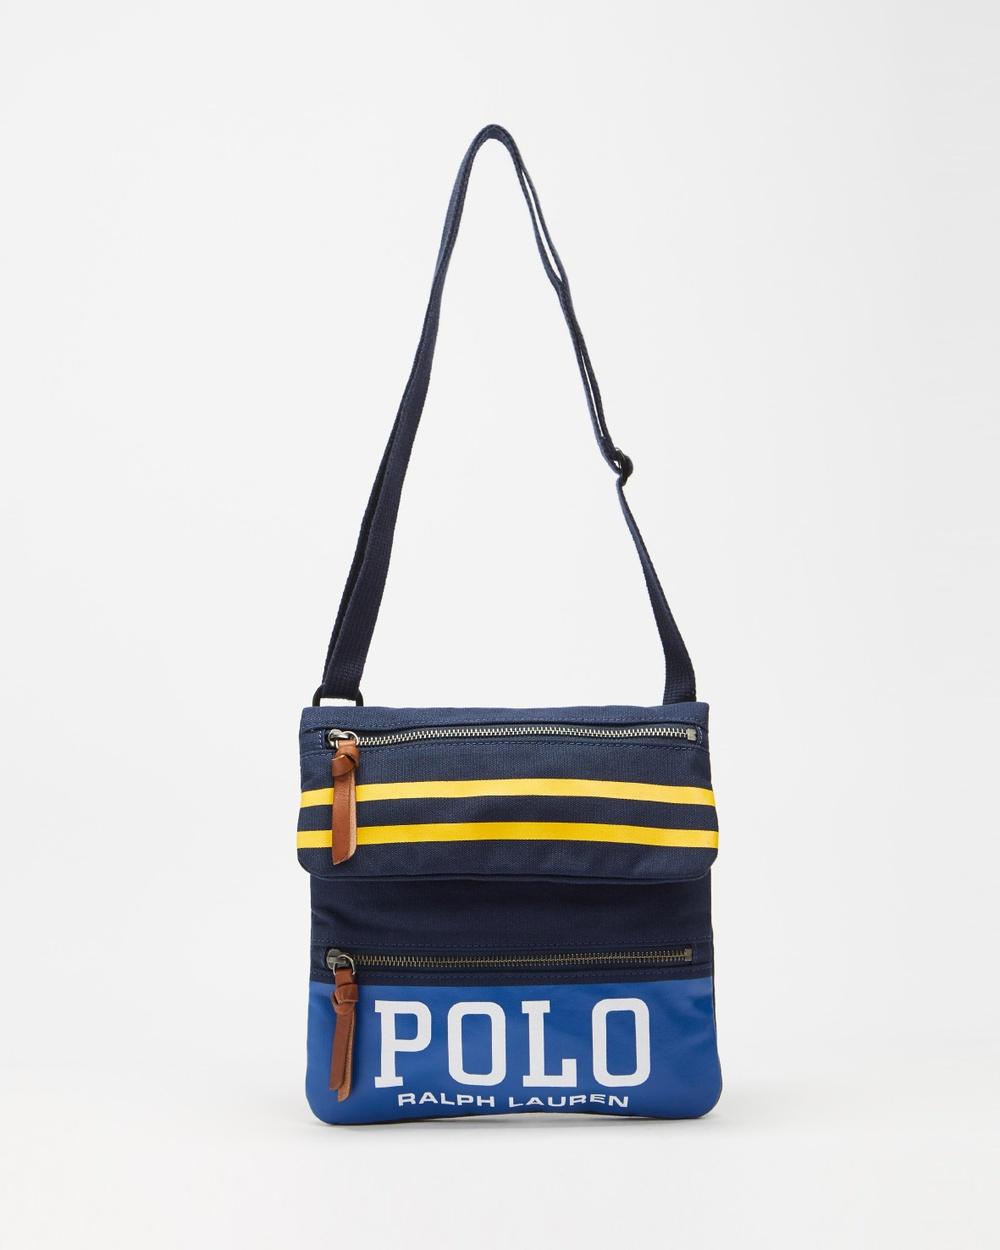 Polo Ralph Lauren Big PCH Bag Satchels Navy